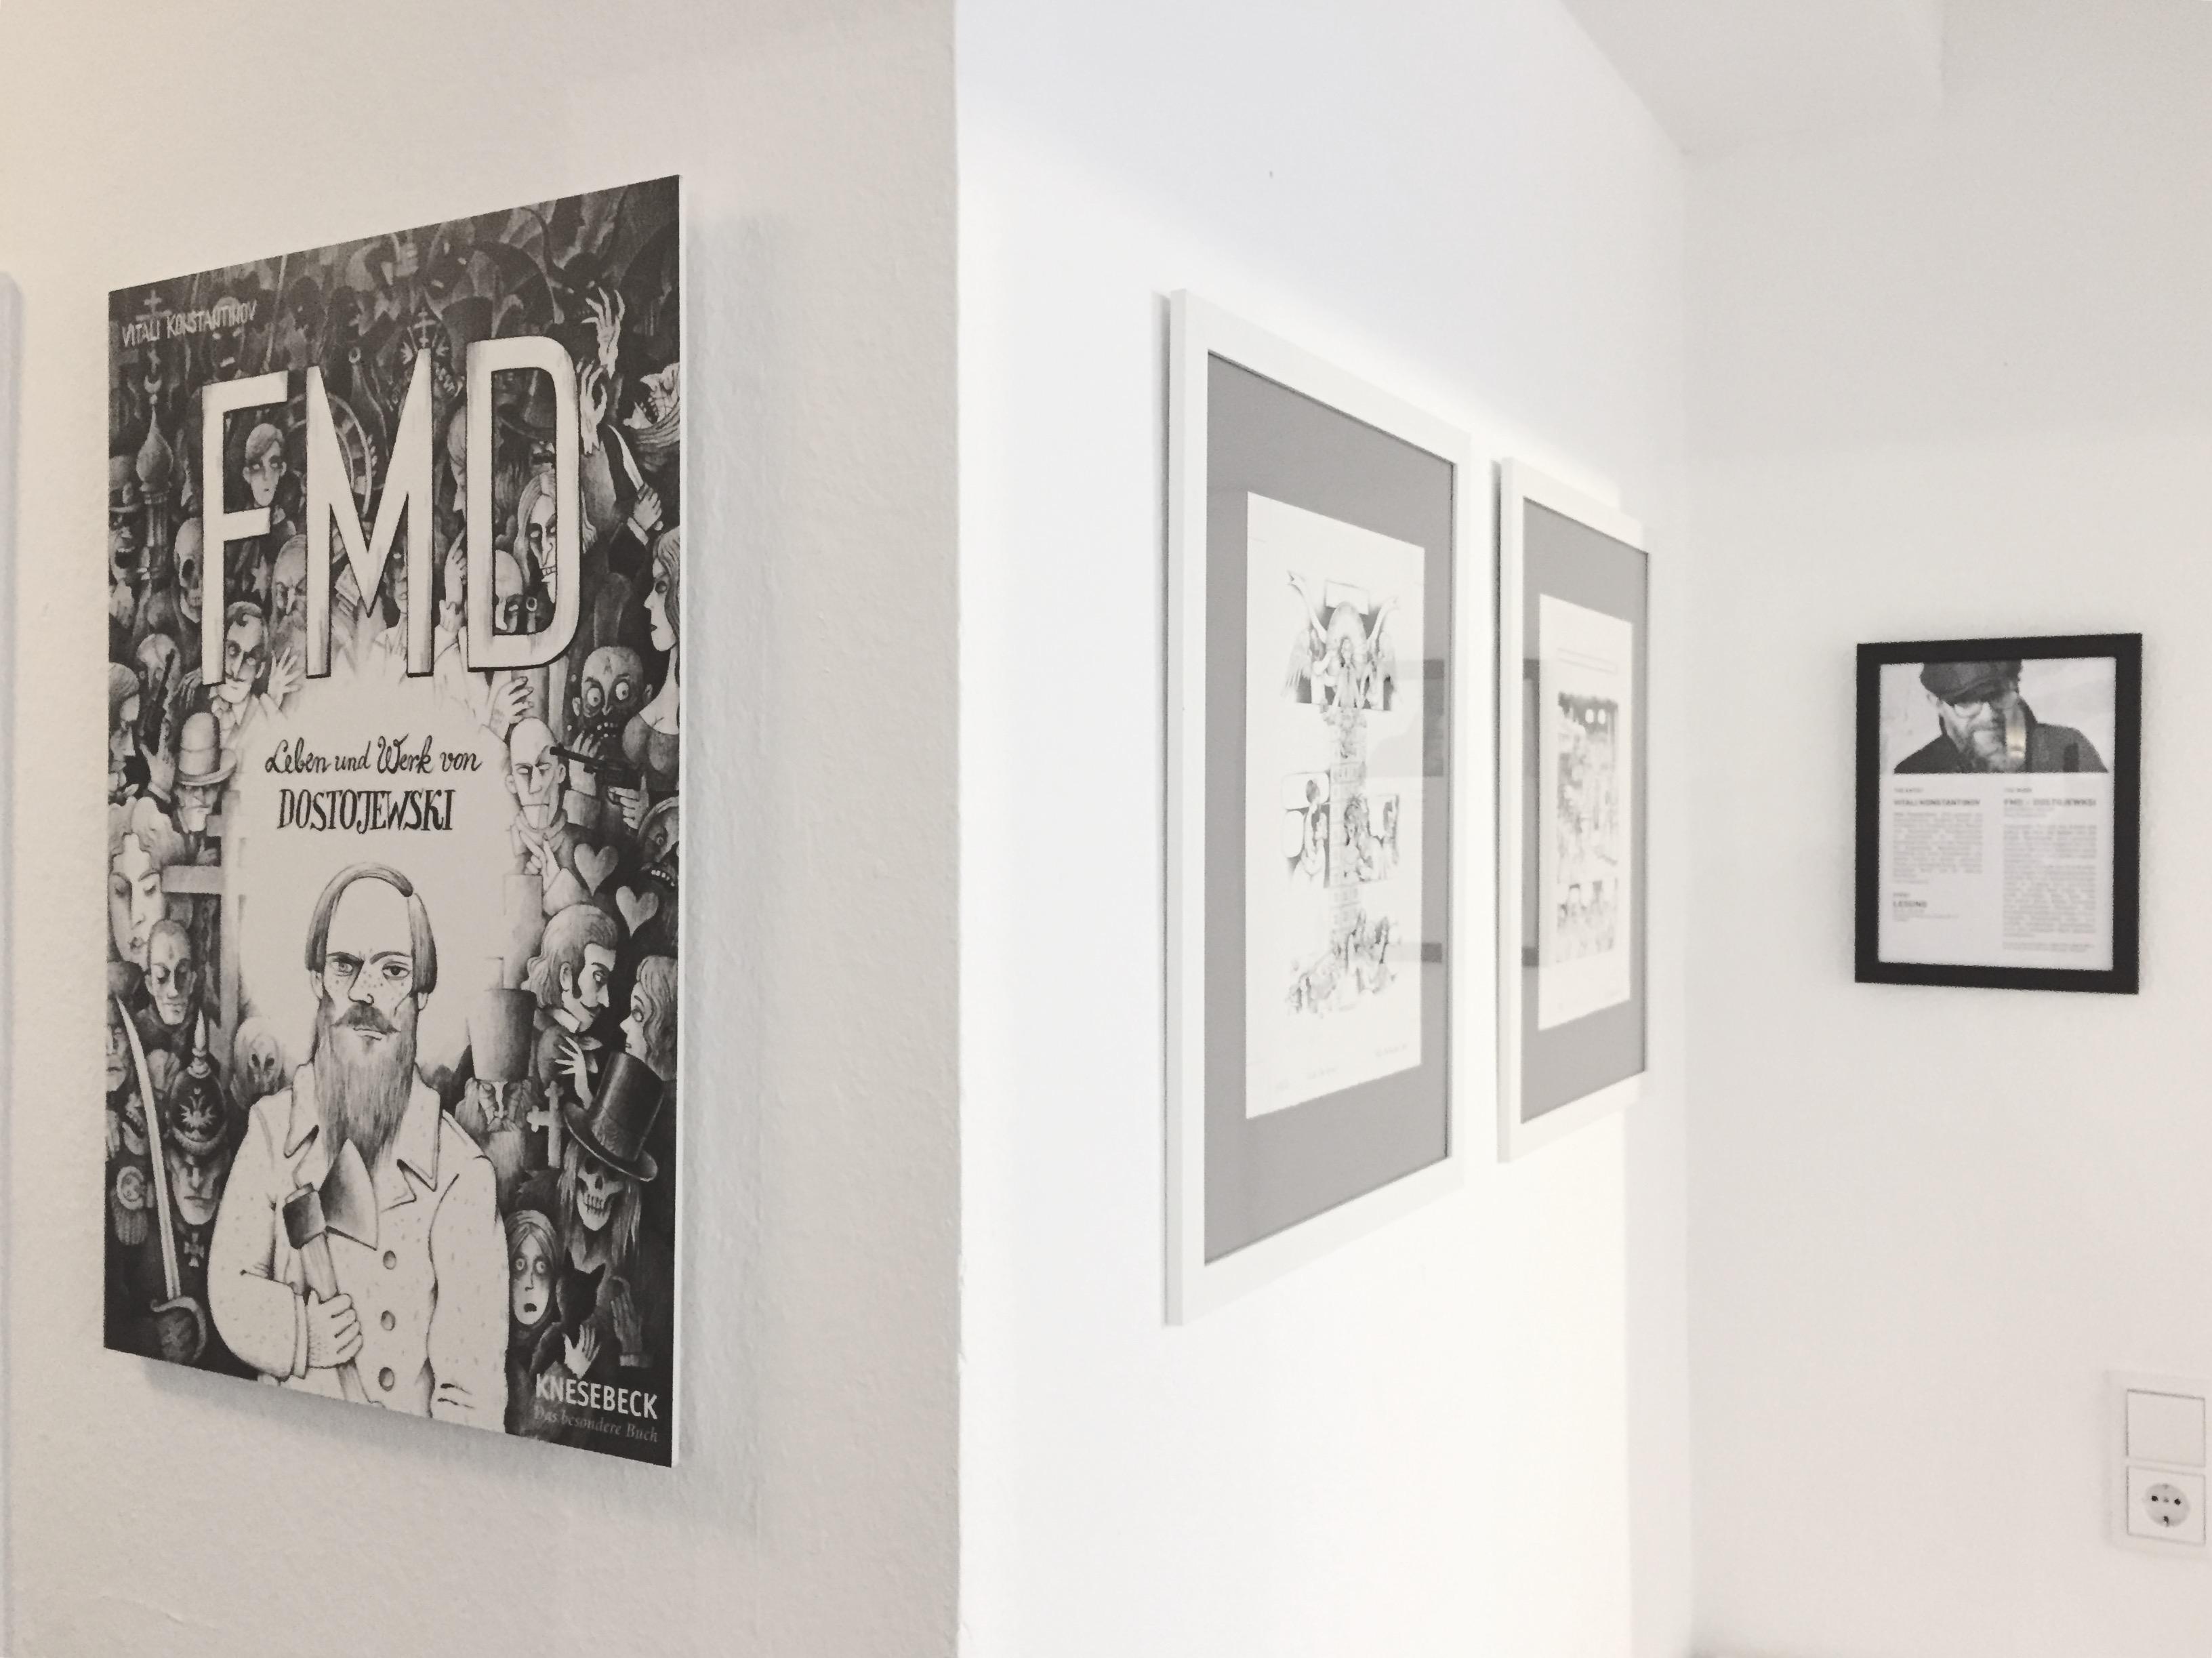 FMD – Dostojewski